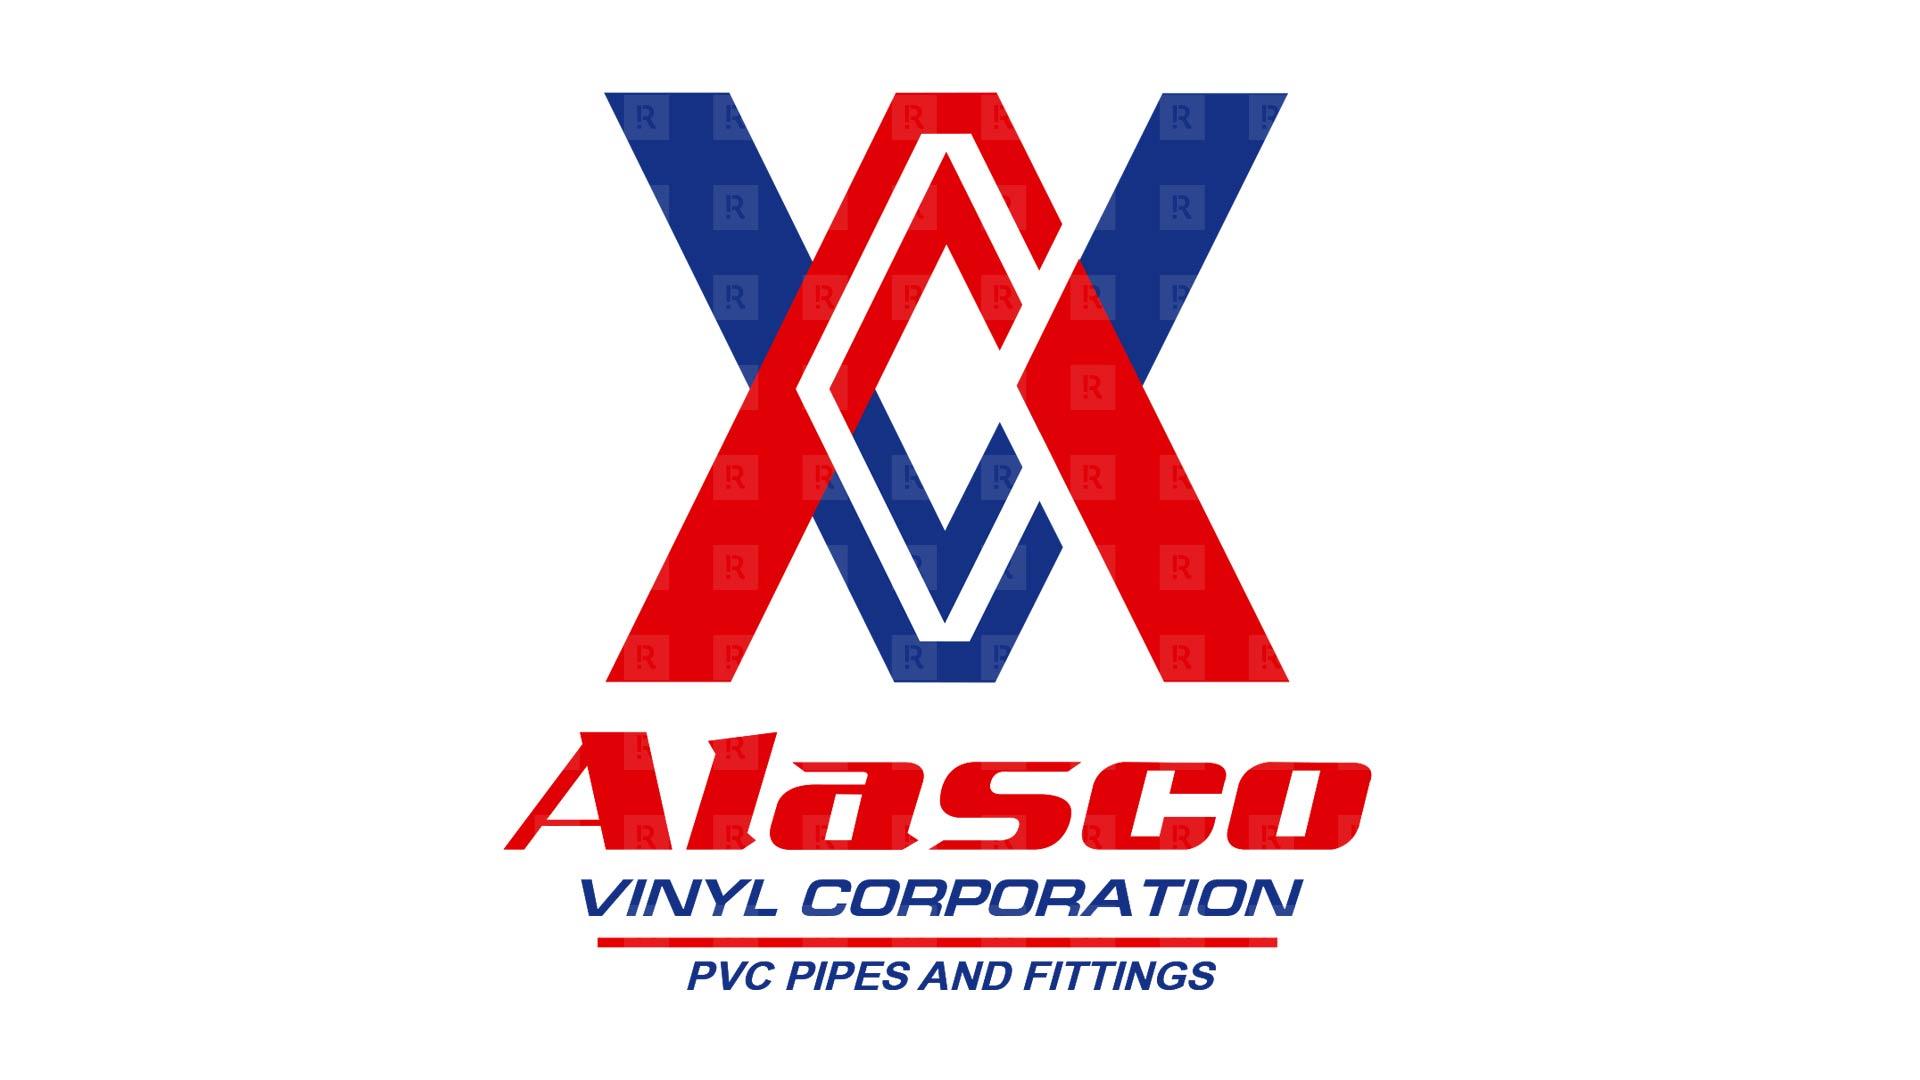 Alasco Corporate Identity